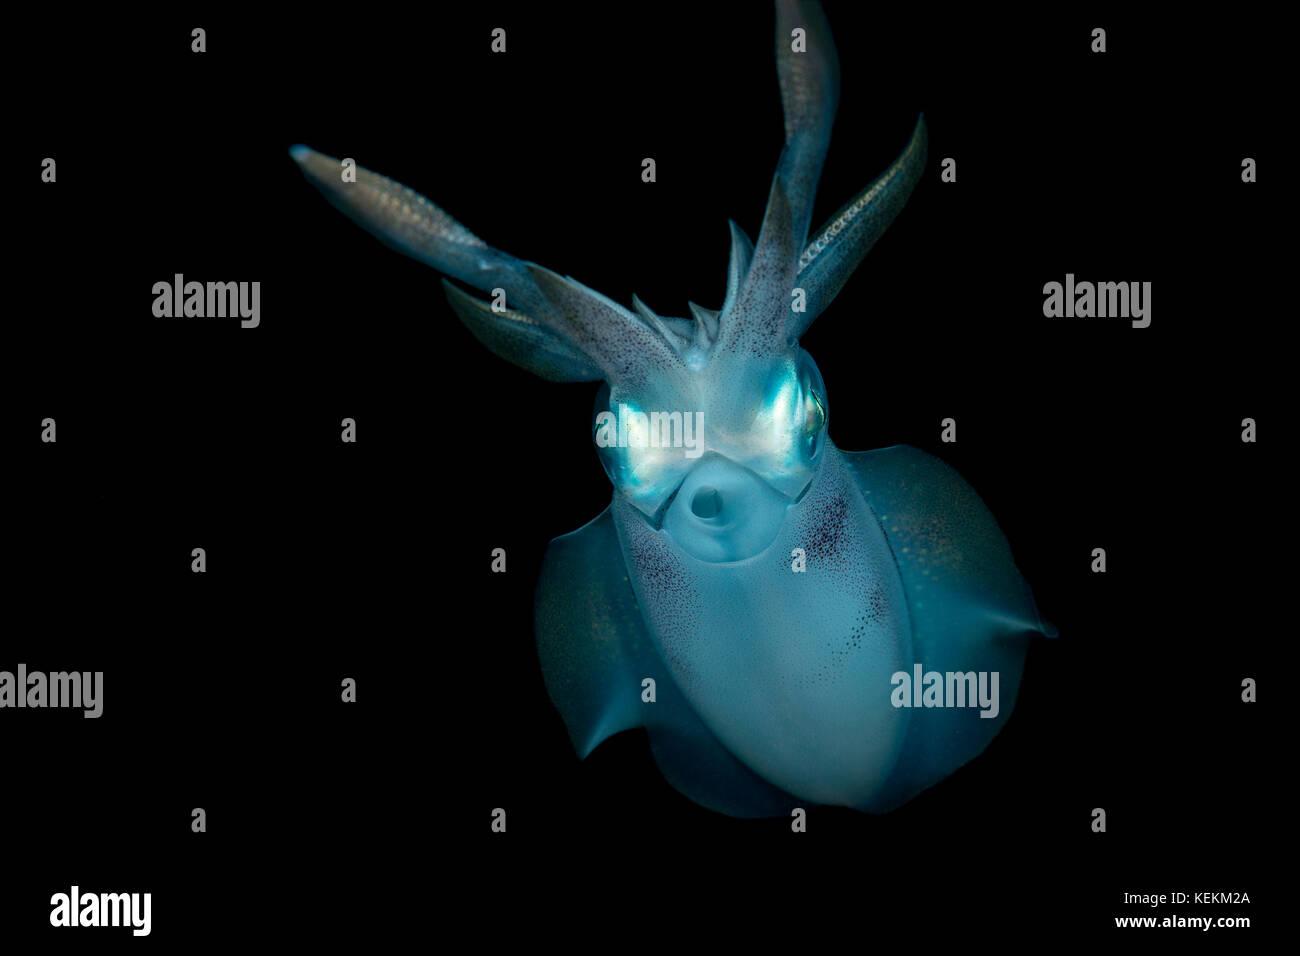 Bigfin Reef Squid, Sepioteuthis lessoniana, Marsa Alam, Red Sea, Egypt - Stock Image